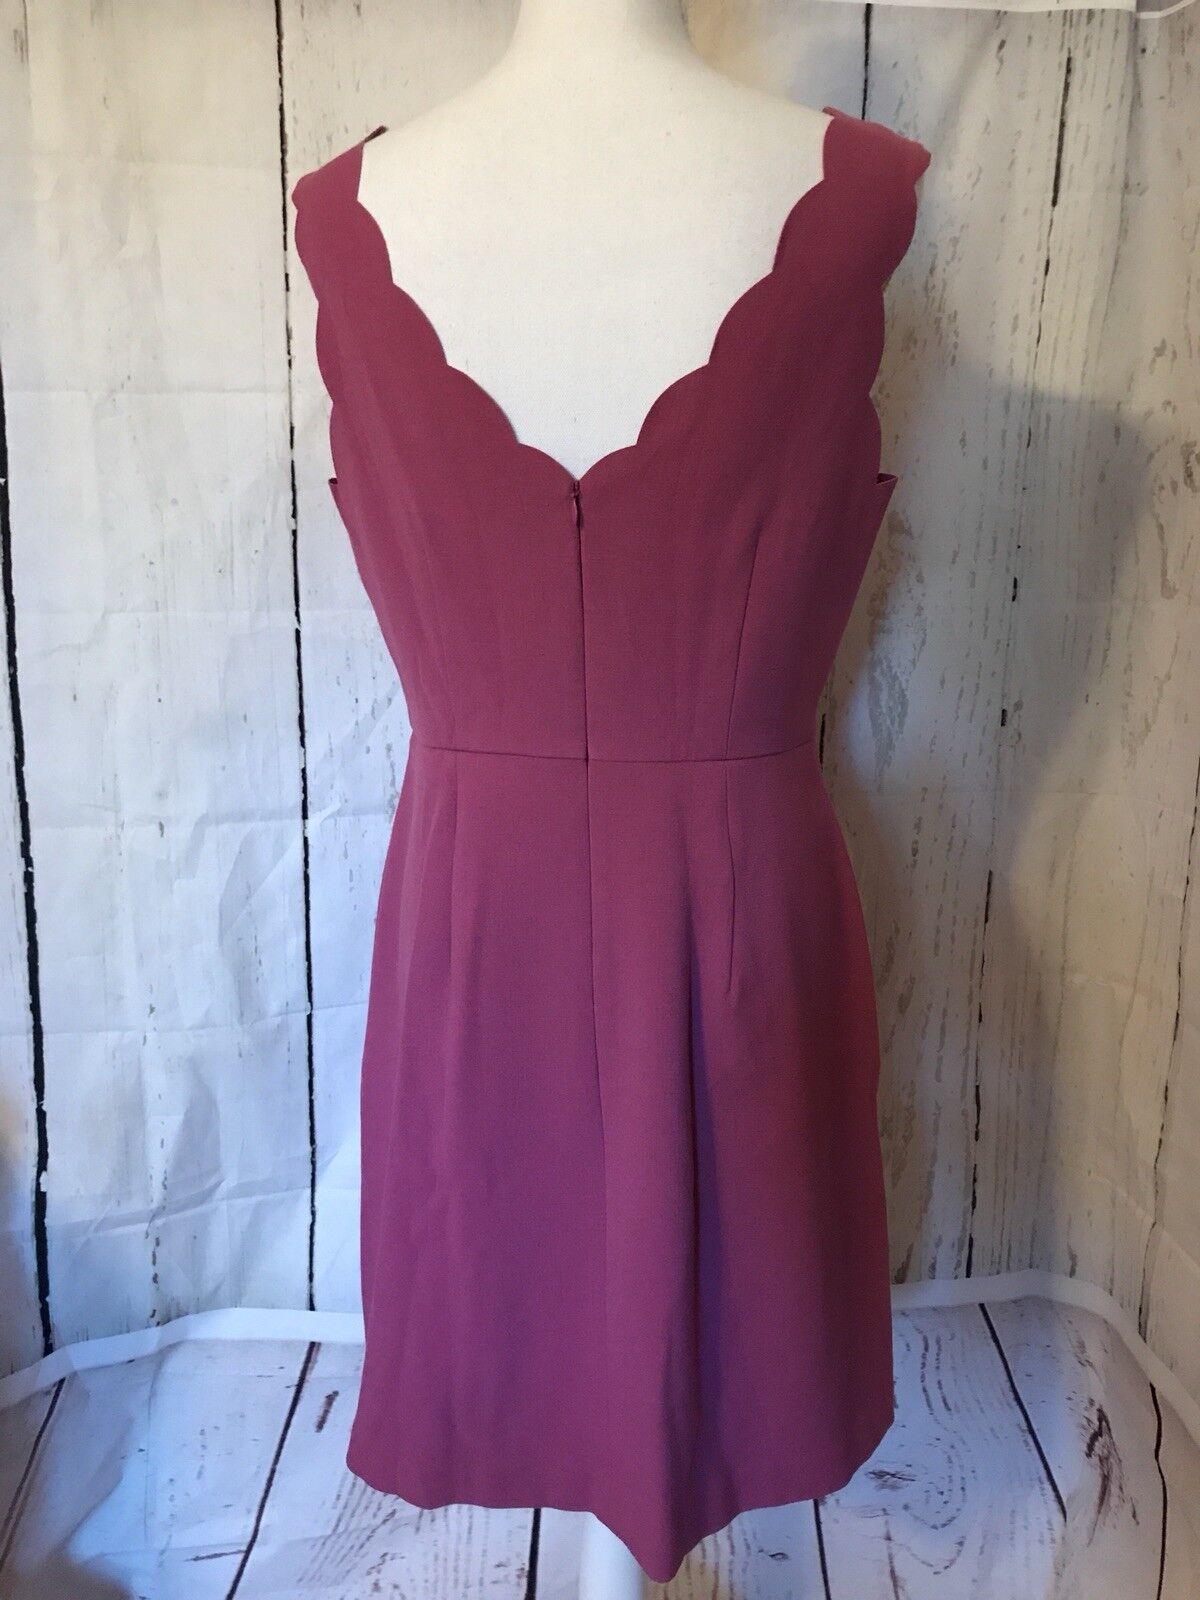 111a6dd903e ... Ann Taylor Loft Dusty pink Pink Scalloped Sleeveless Dress Dress Dress  Women s Size 10 NWT e21829 ...